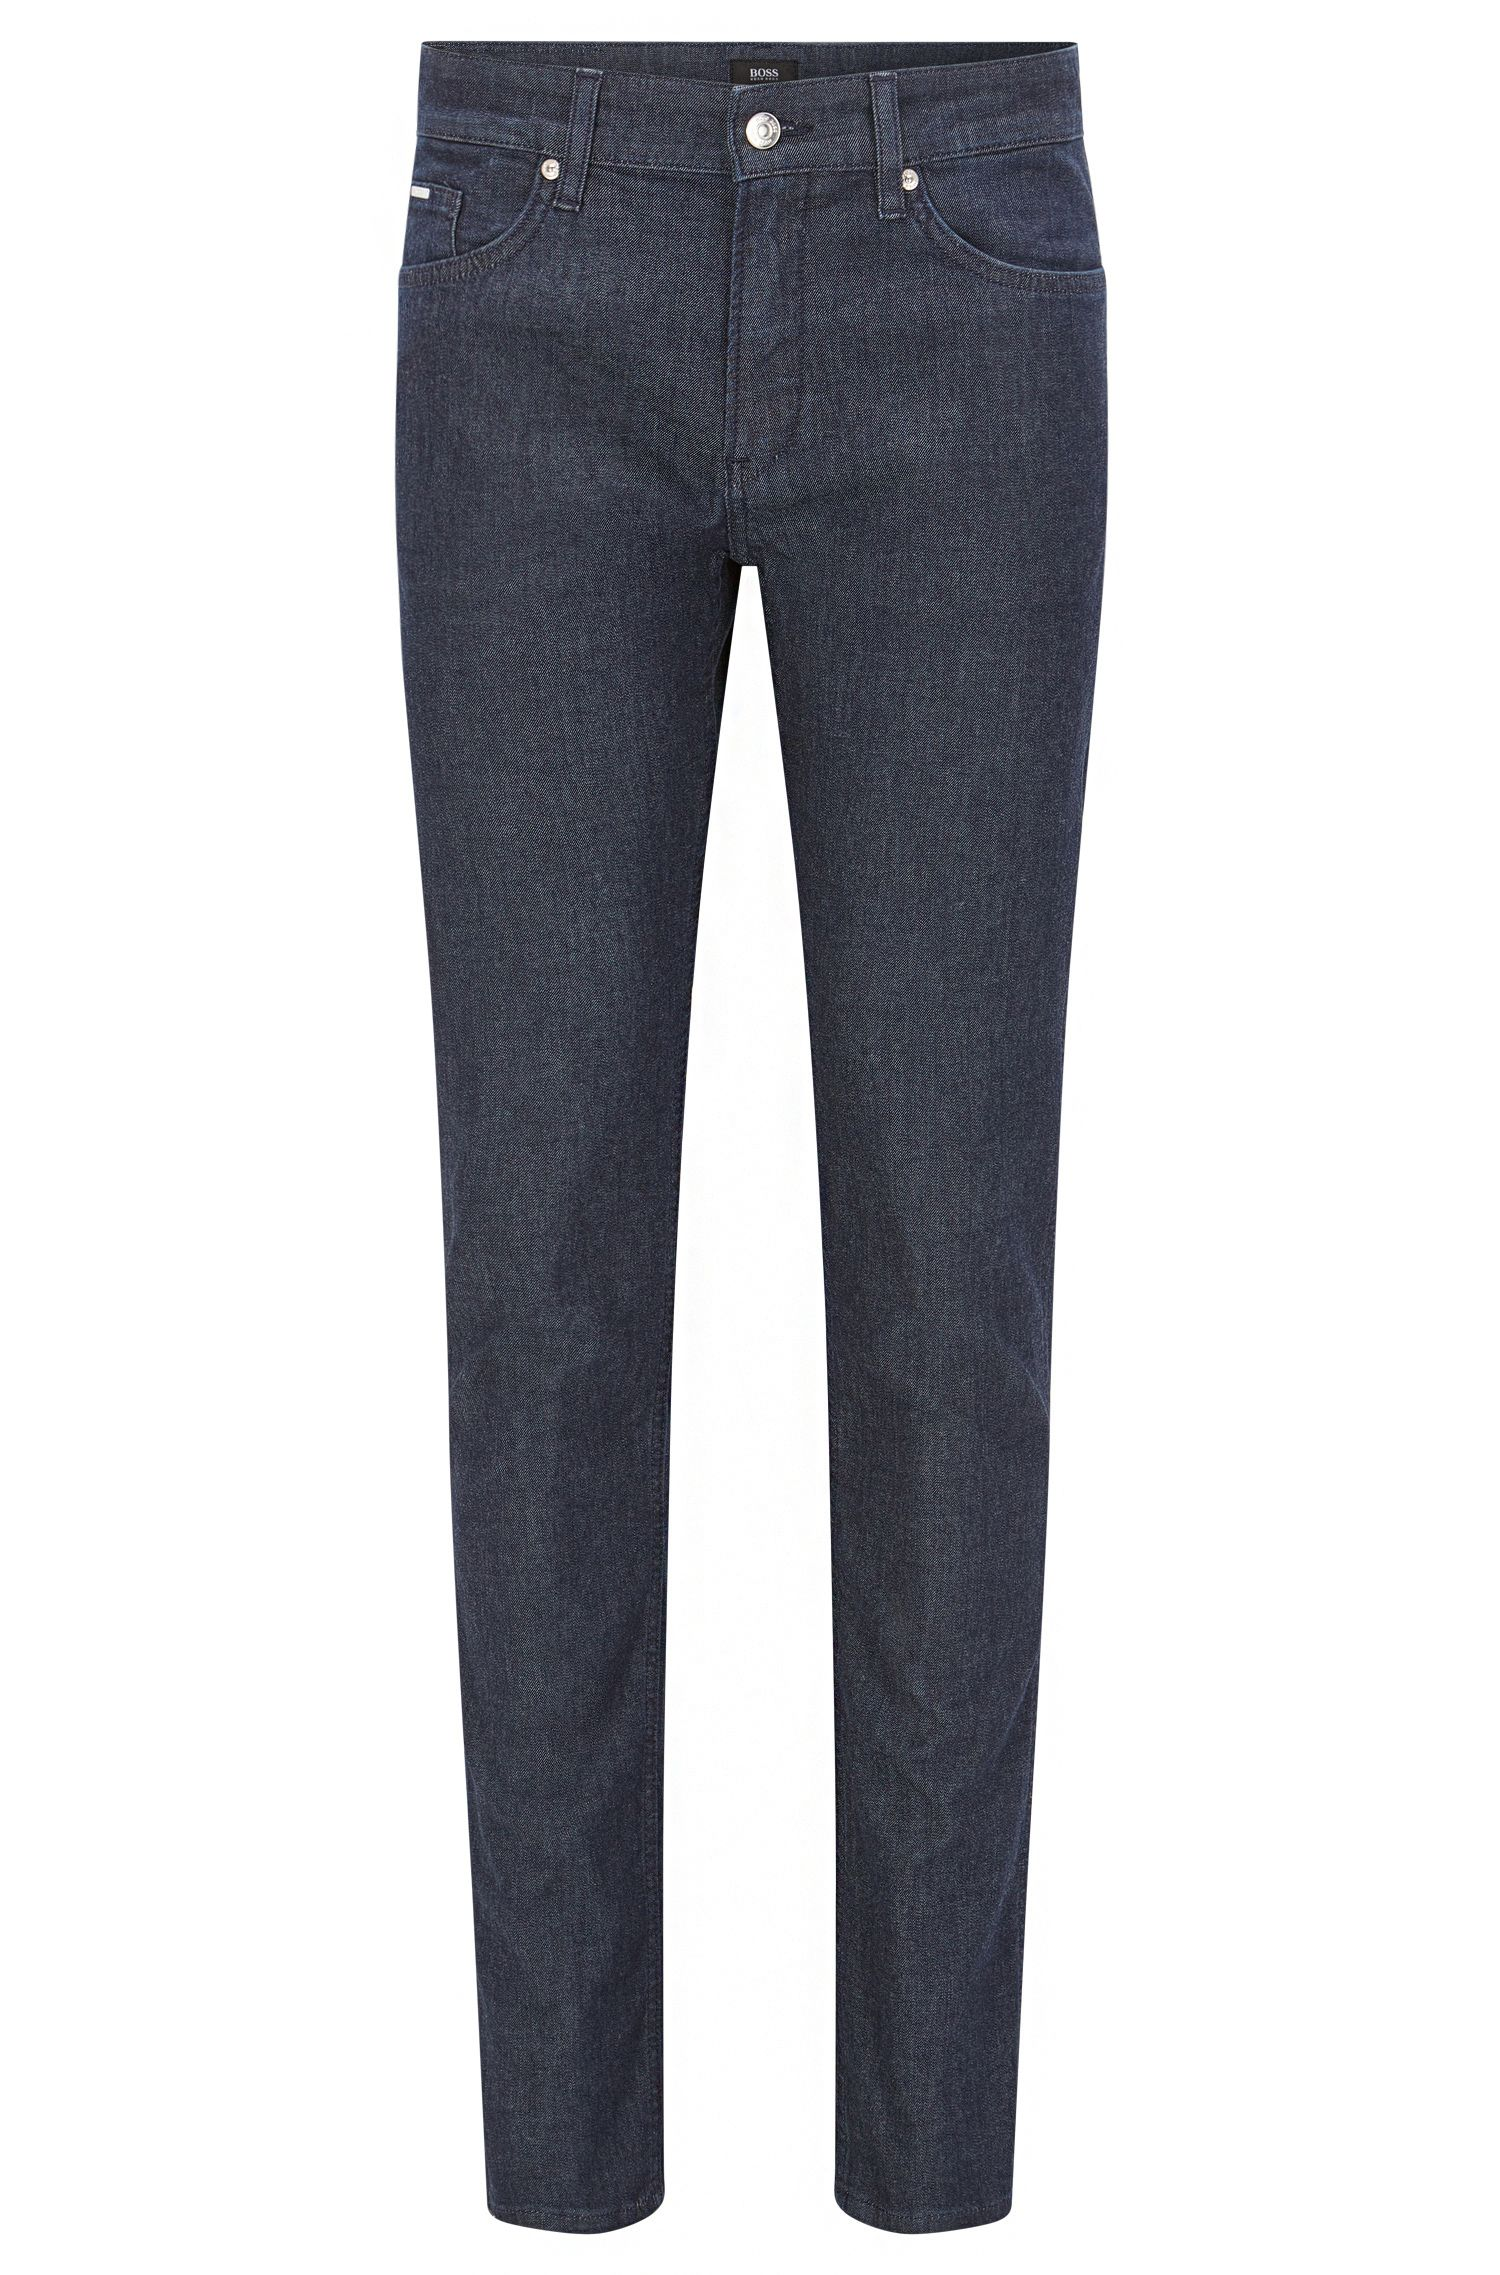 Jeans Slim Fit bleu foncé en denim stretch